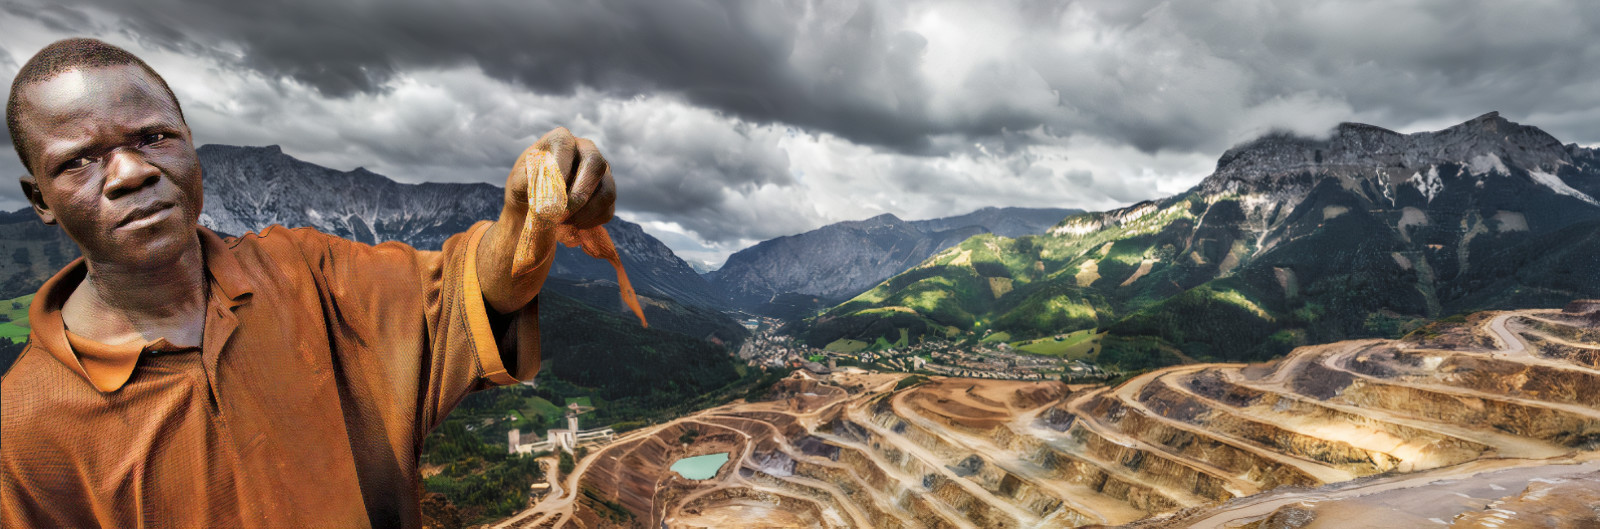 justice in mining - imagen